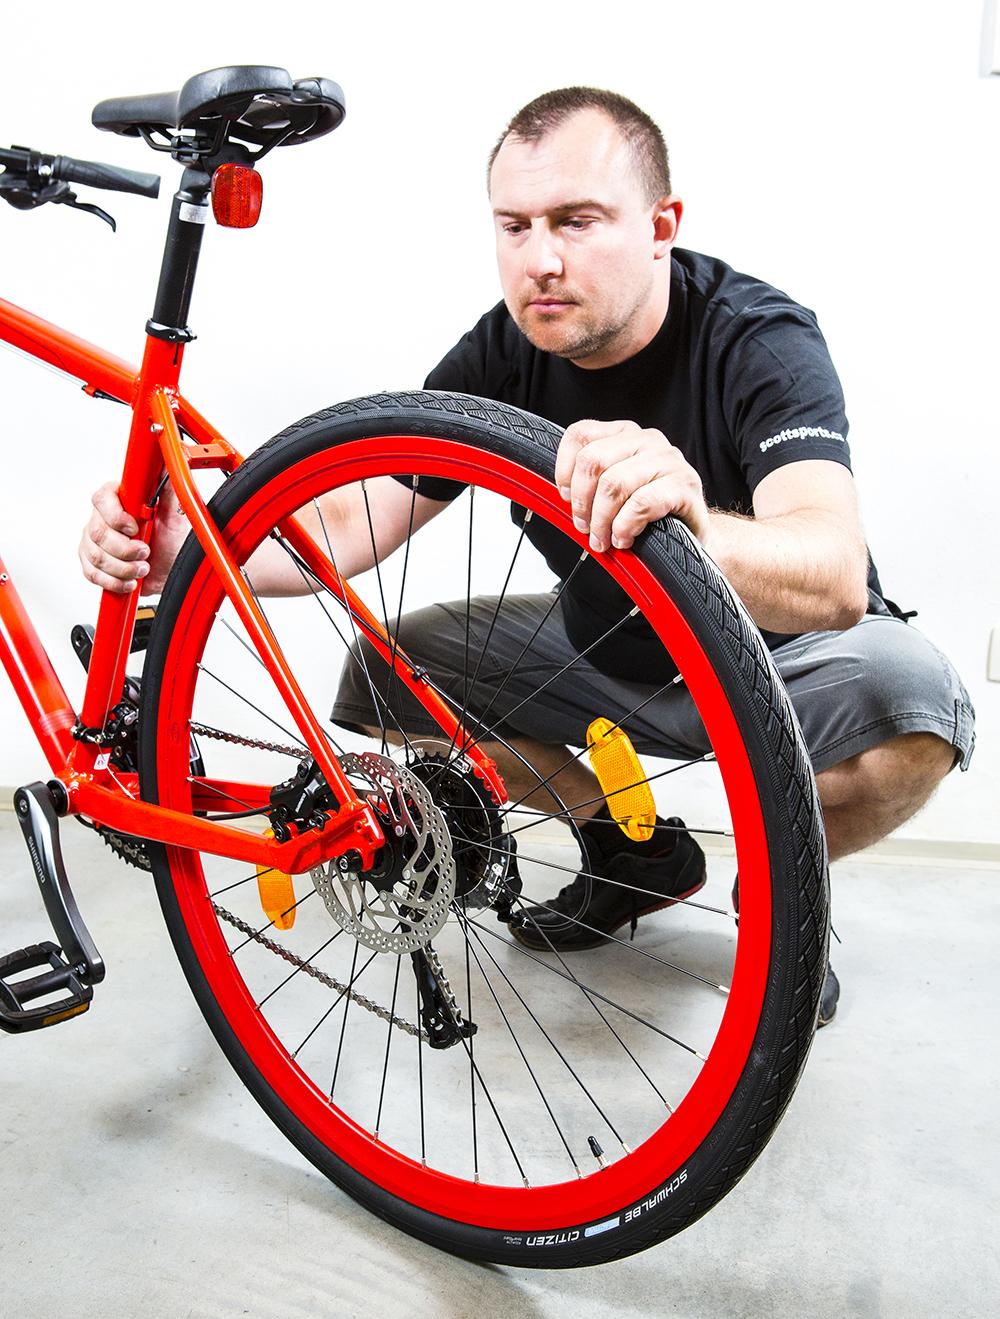 Horský bicykel vs. Hybrid. Foto: Shutterstock